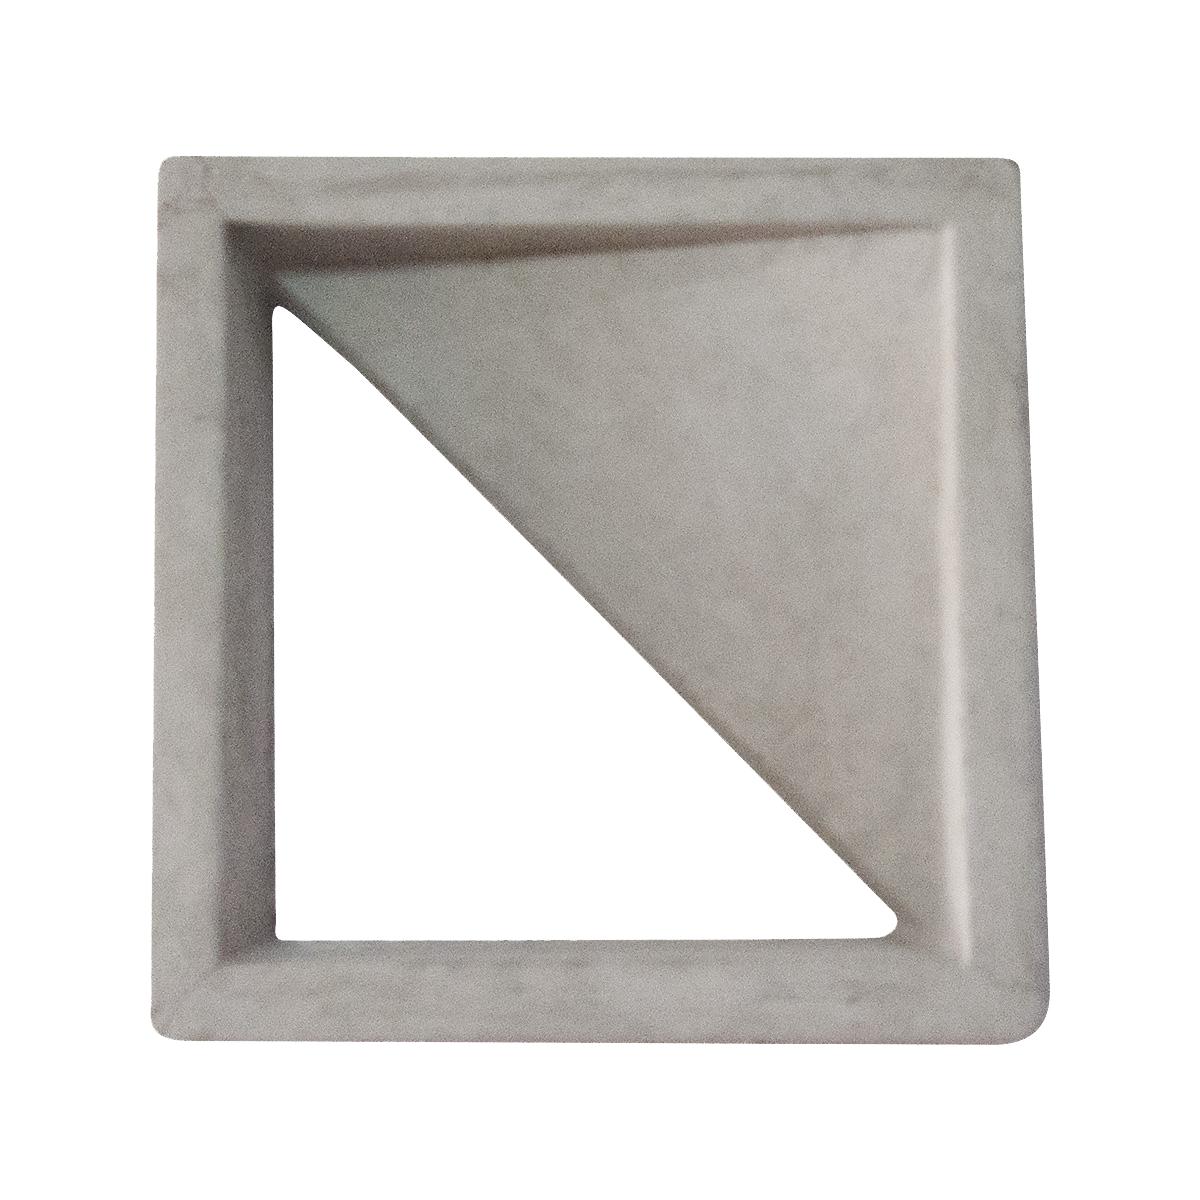 Elemento vazado triângulo - Foto 3